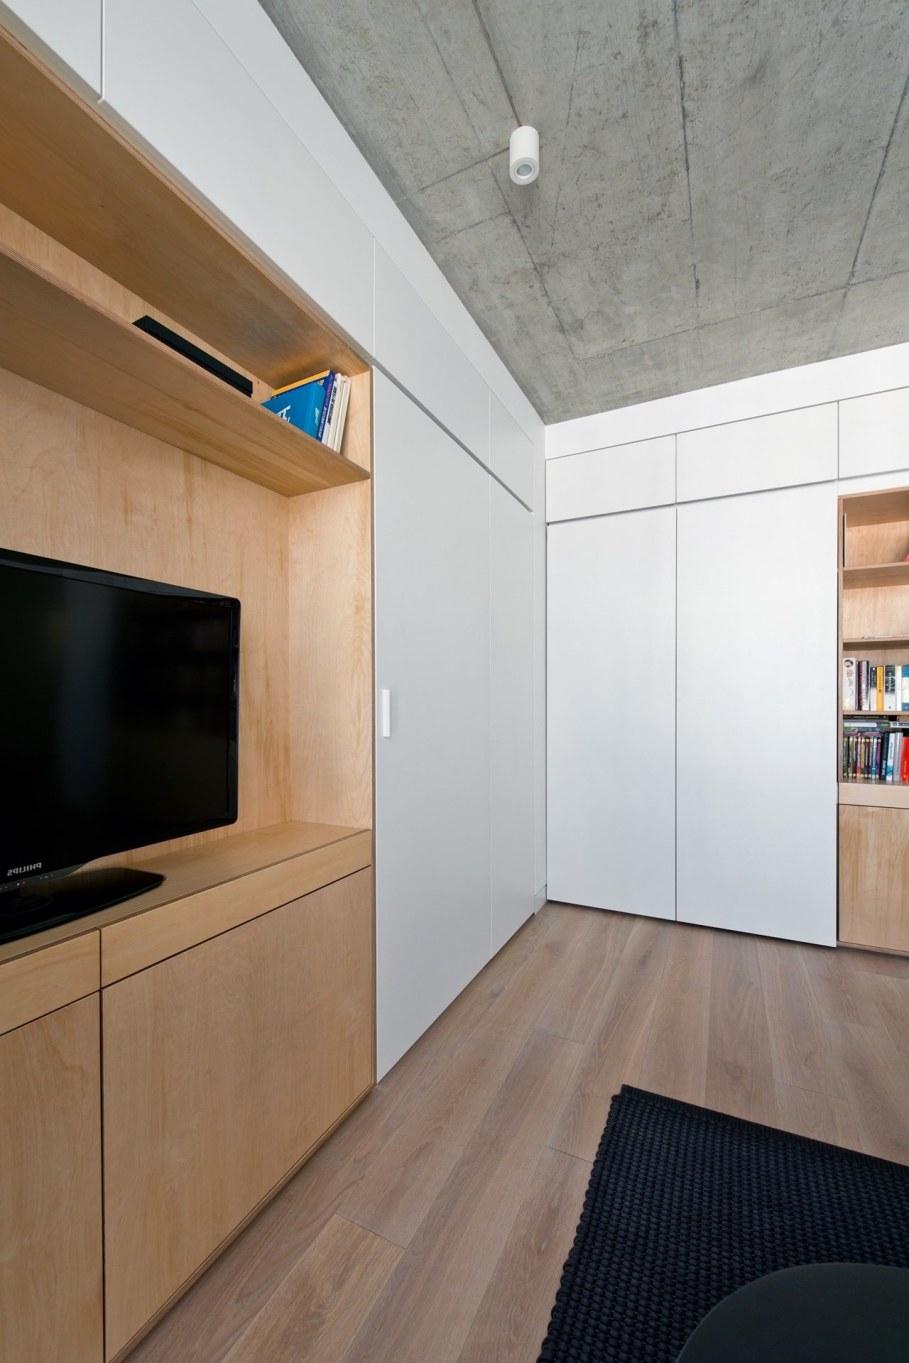 Apartment In Vilnius from Normundas Vilkas - Interior